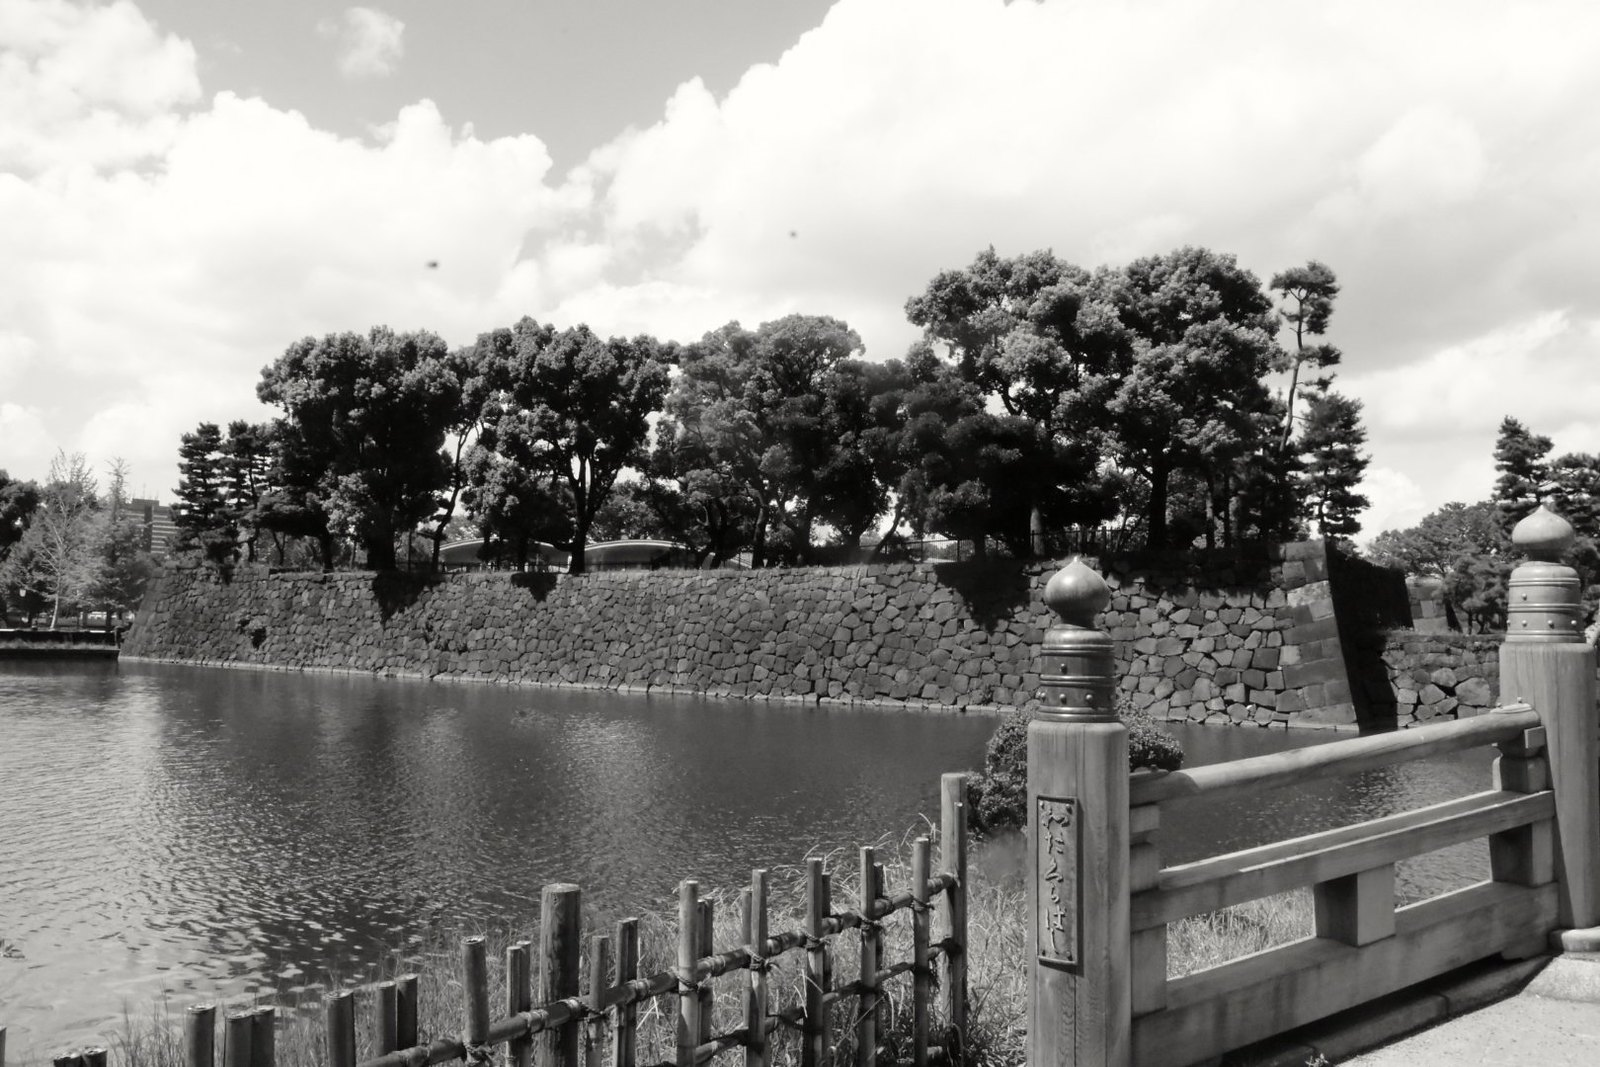 Marunouchi - Abords du palais impérial